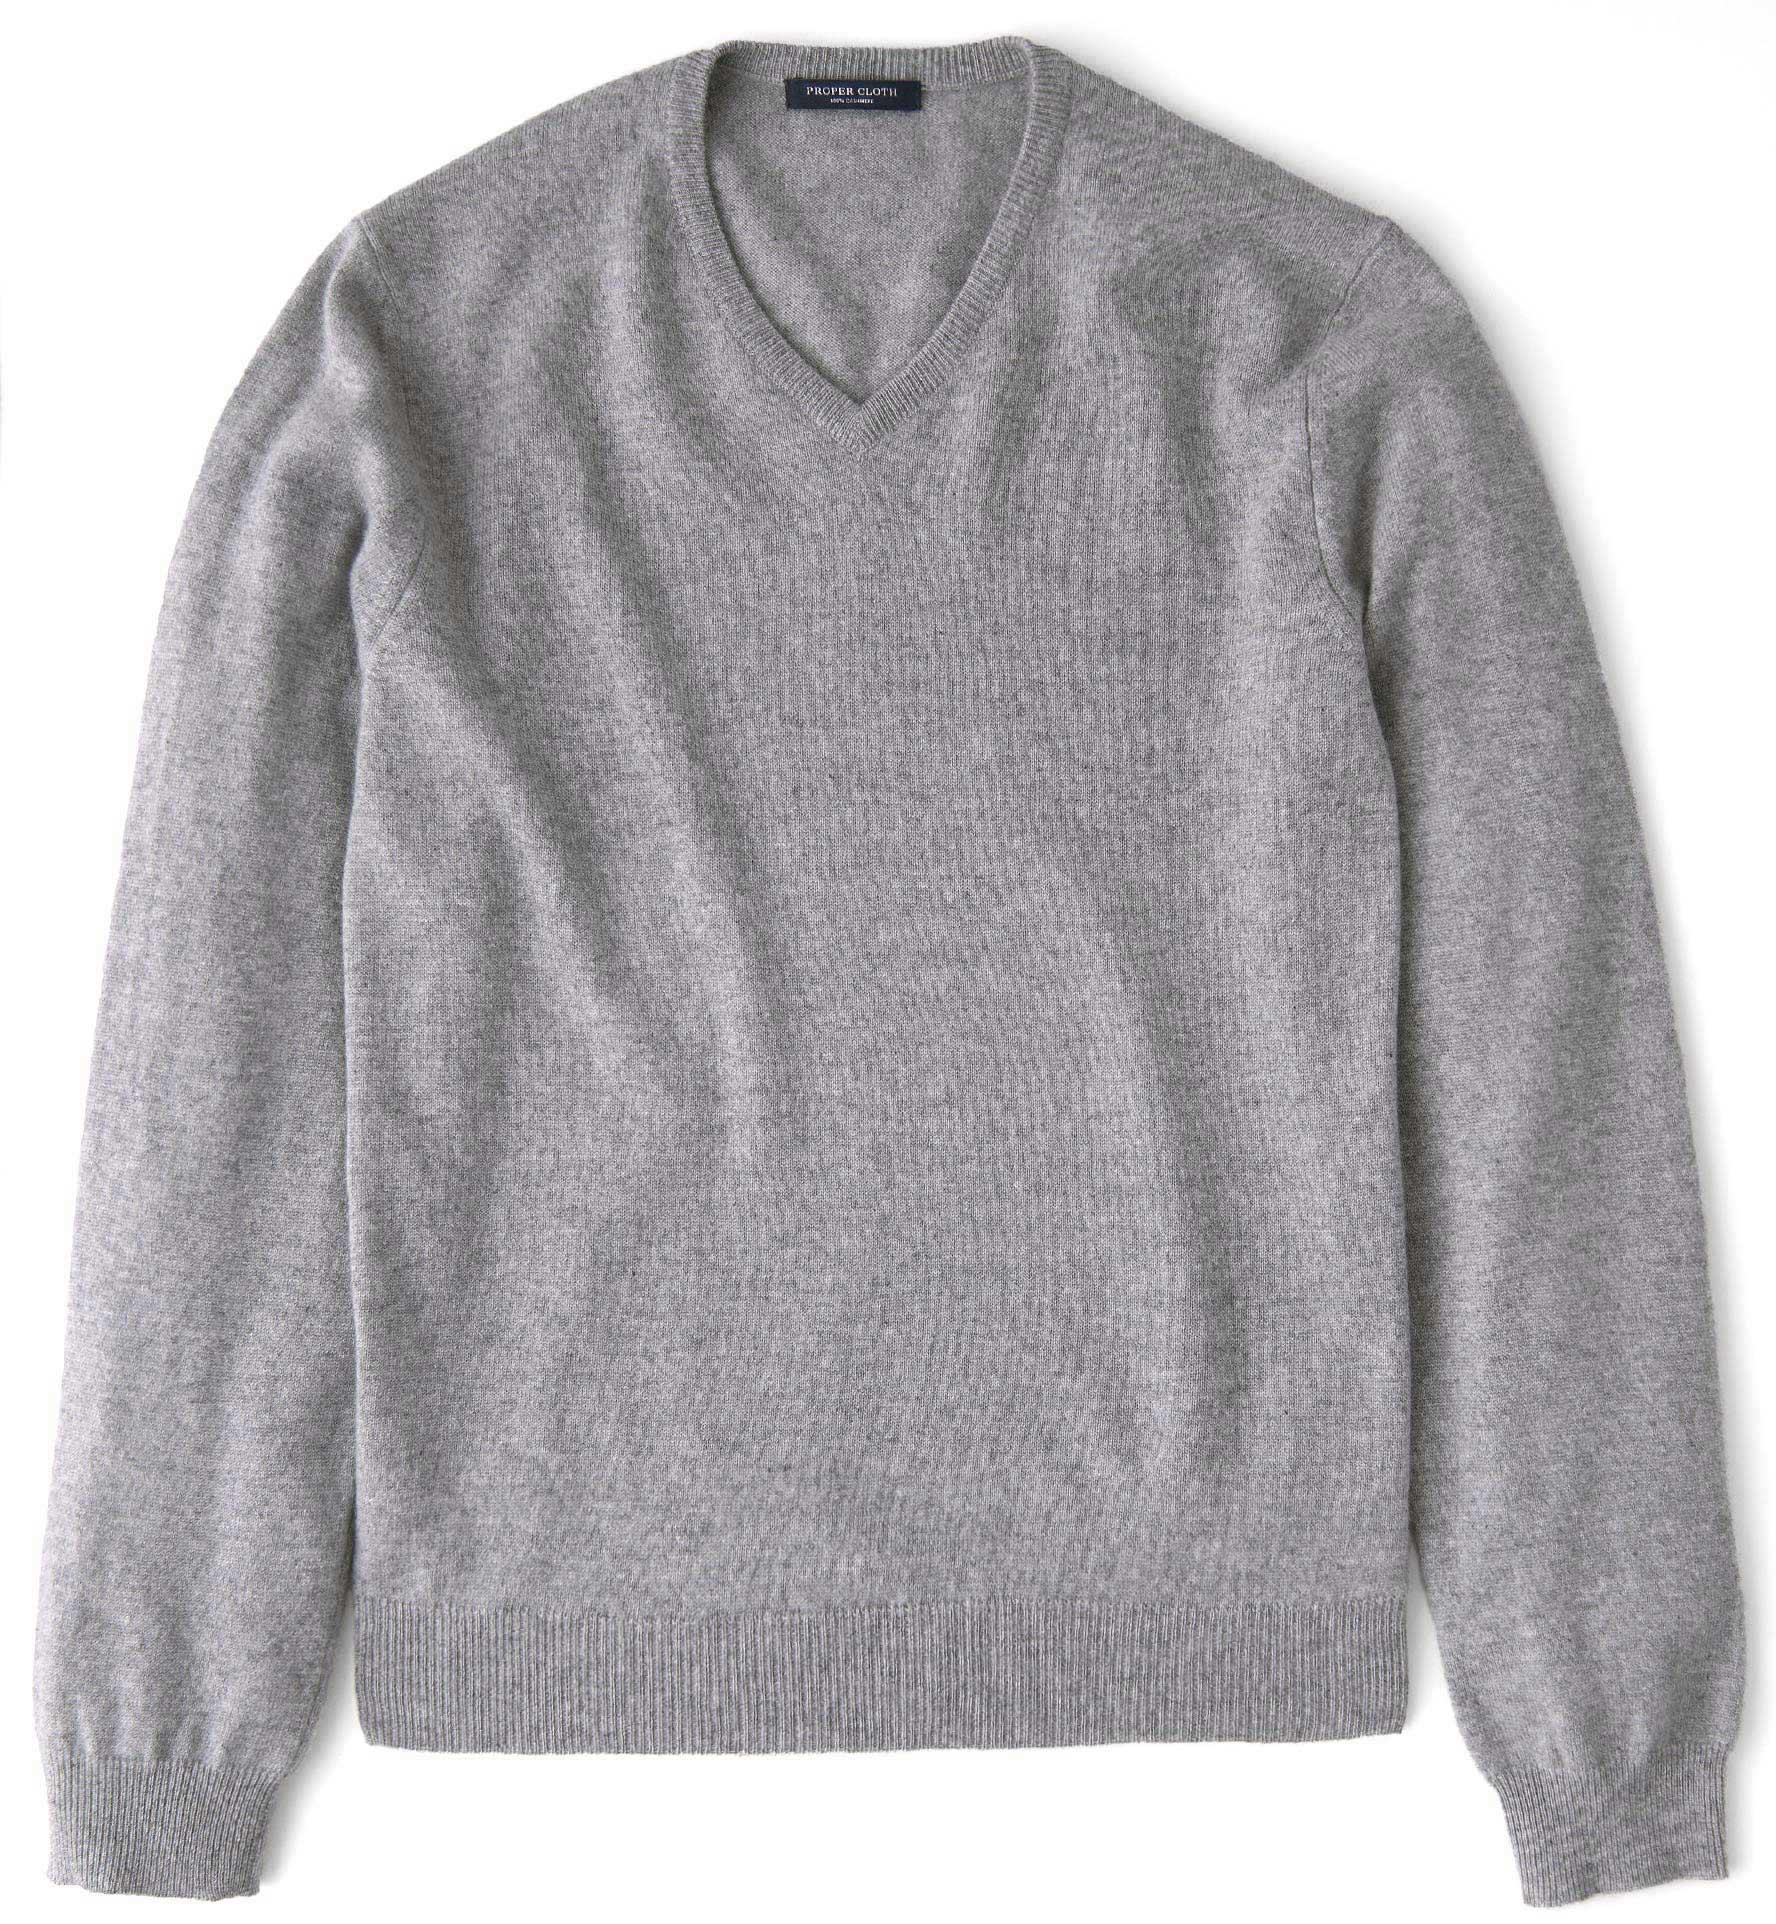 Zoom Image of Light Grey Cashmere V-Neck Sweater